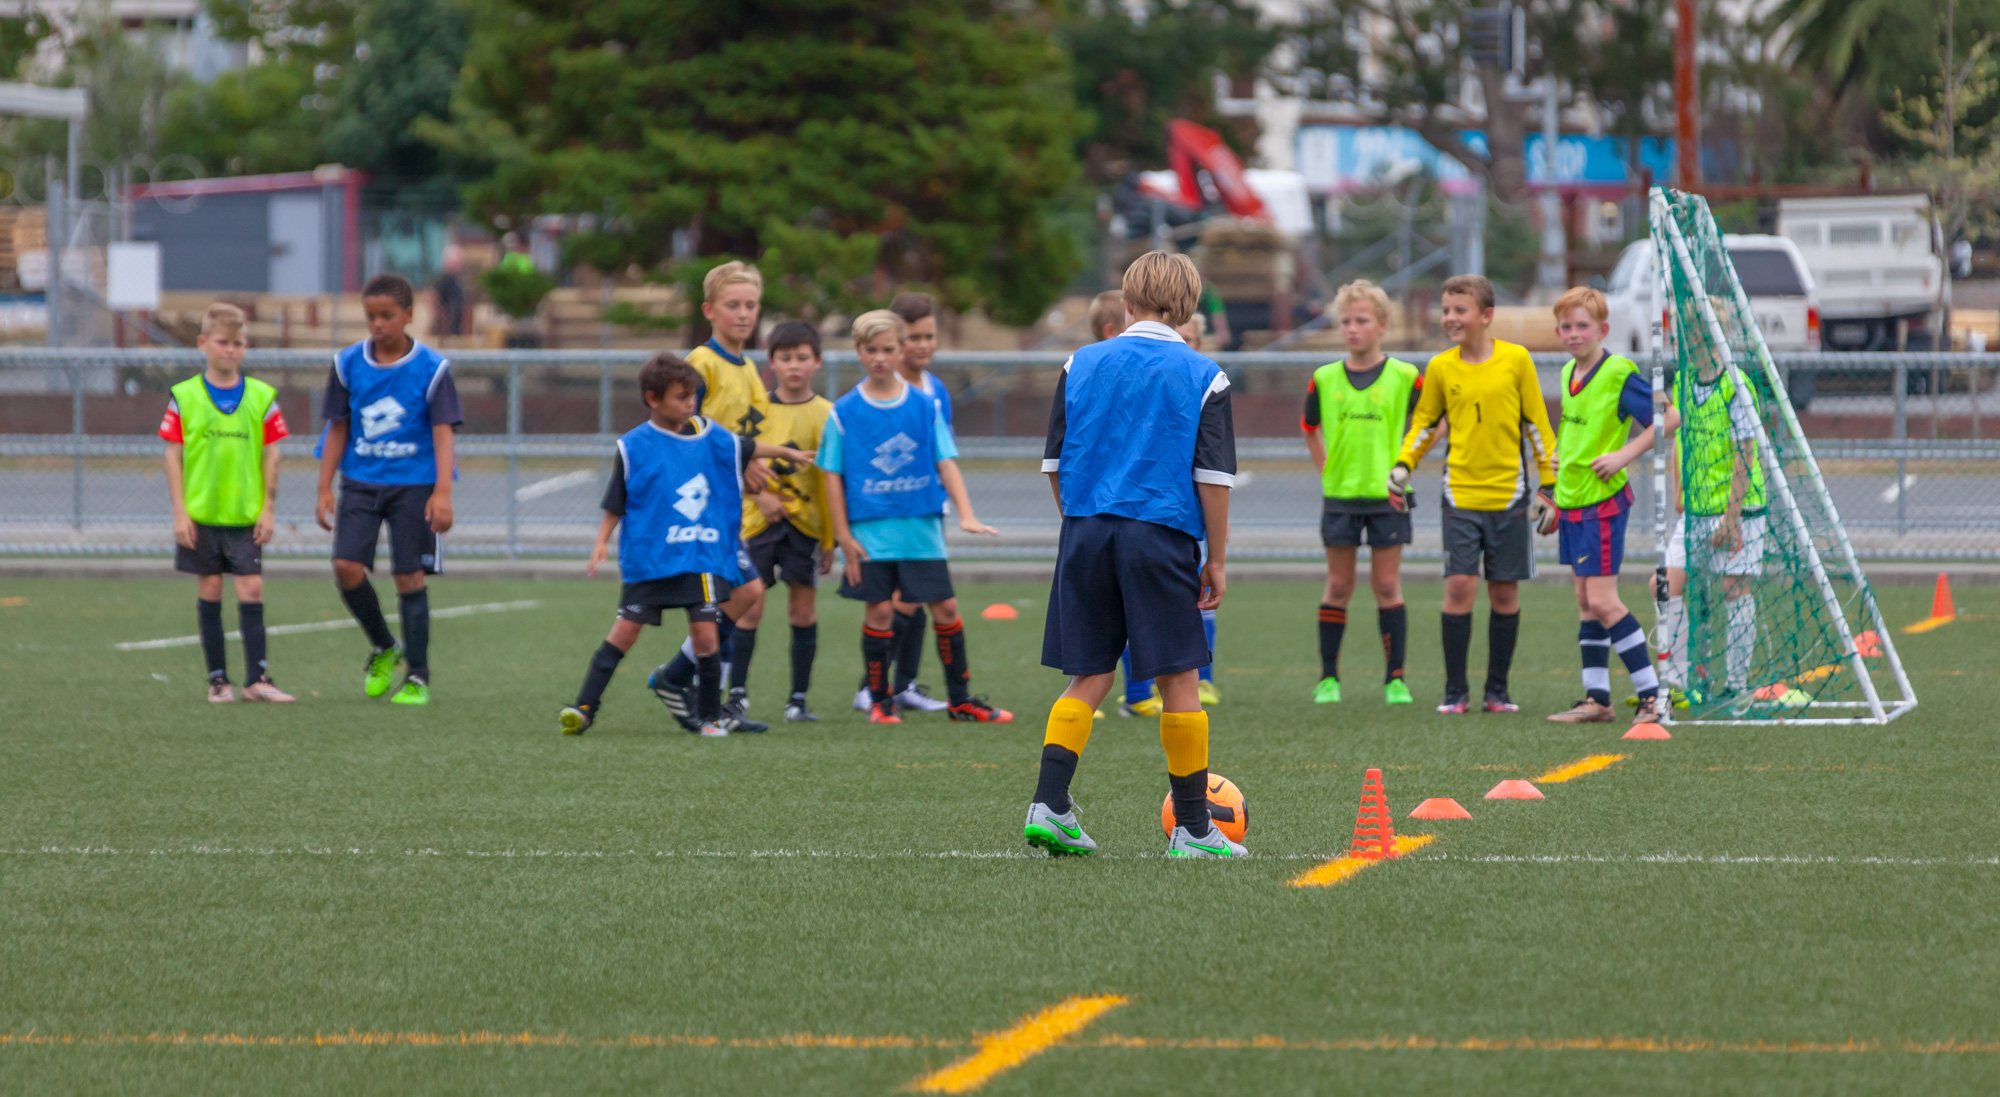 UHCC Soccer Coach 4455